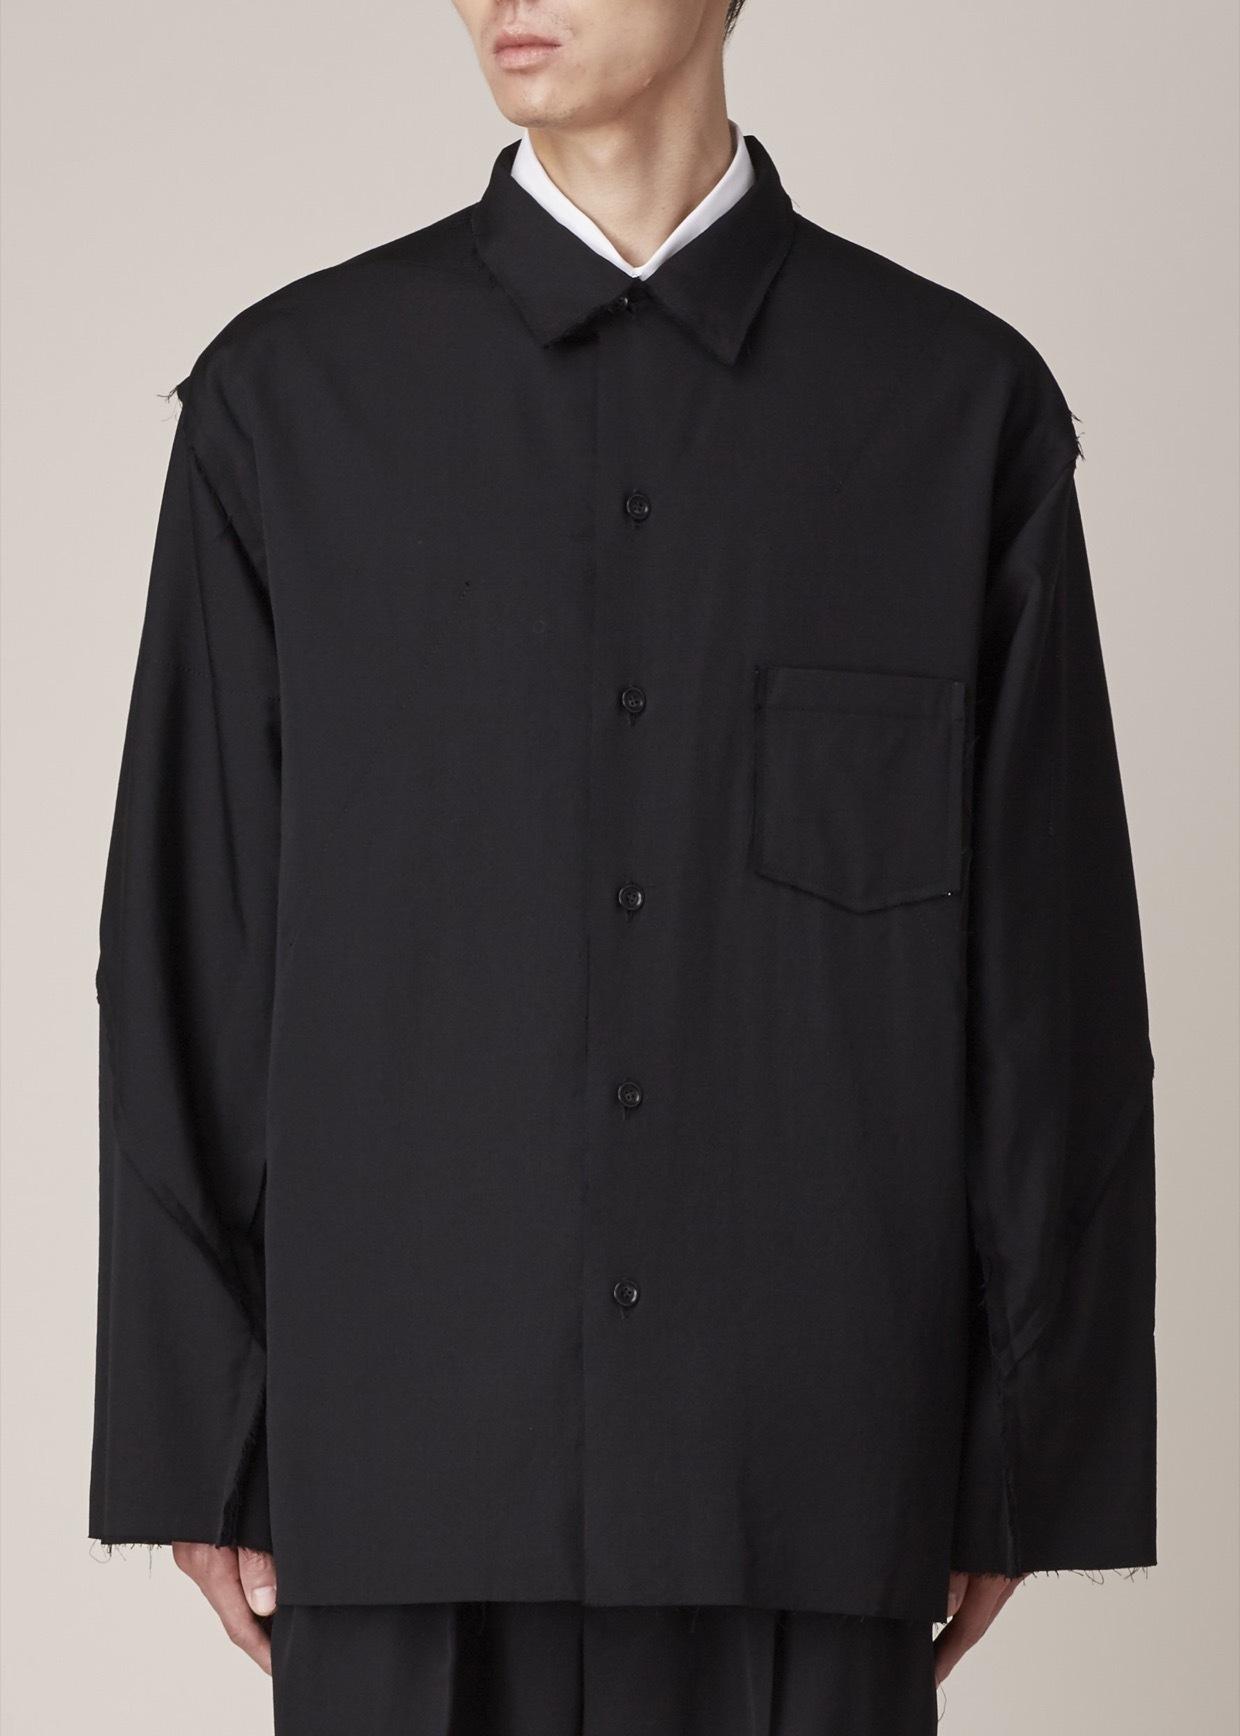 Yohji yamamoto Black Straight Jacket in Black for Men | Lyst